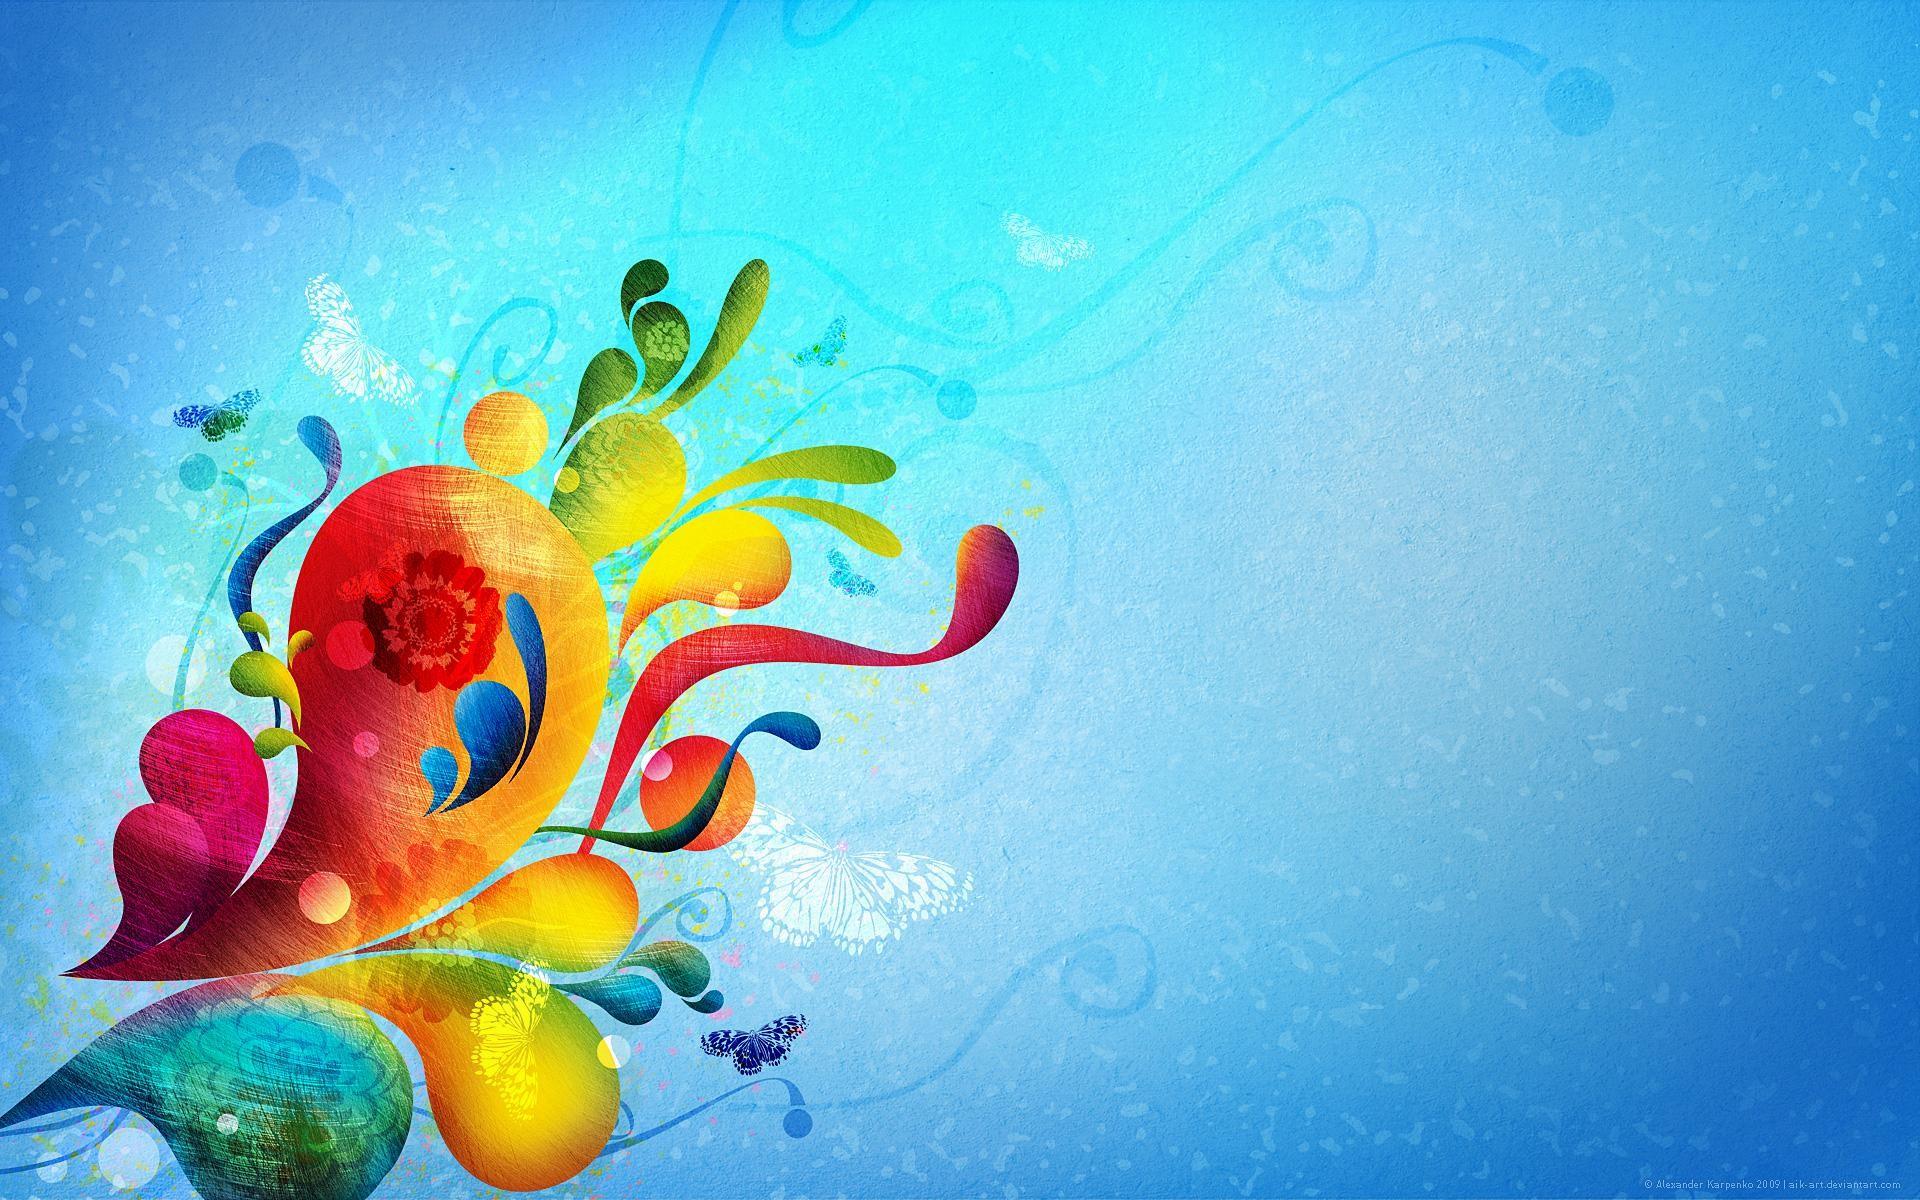 girly-background-hd-cute-abstract-wallpaper-light-modern-